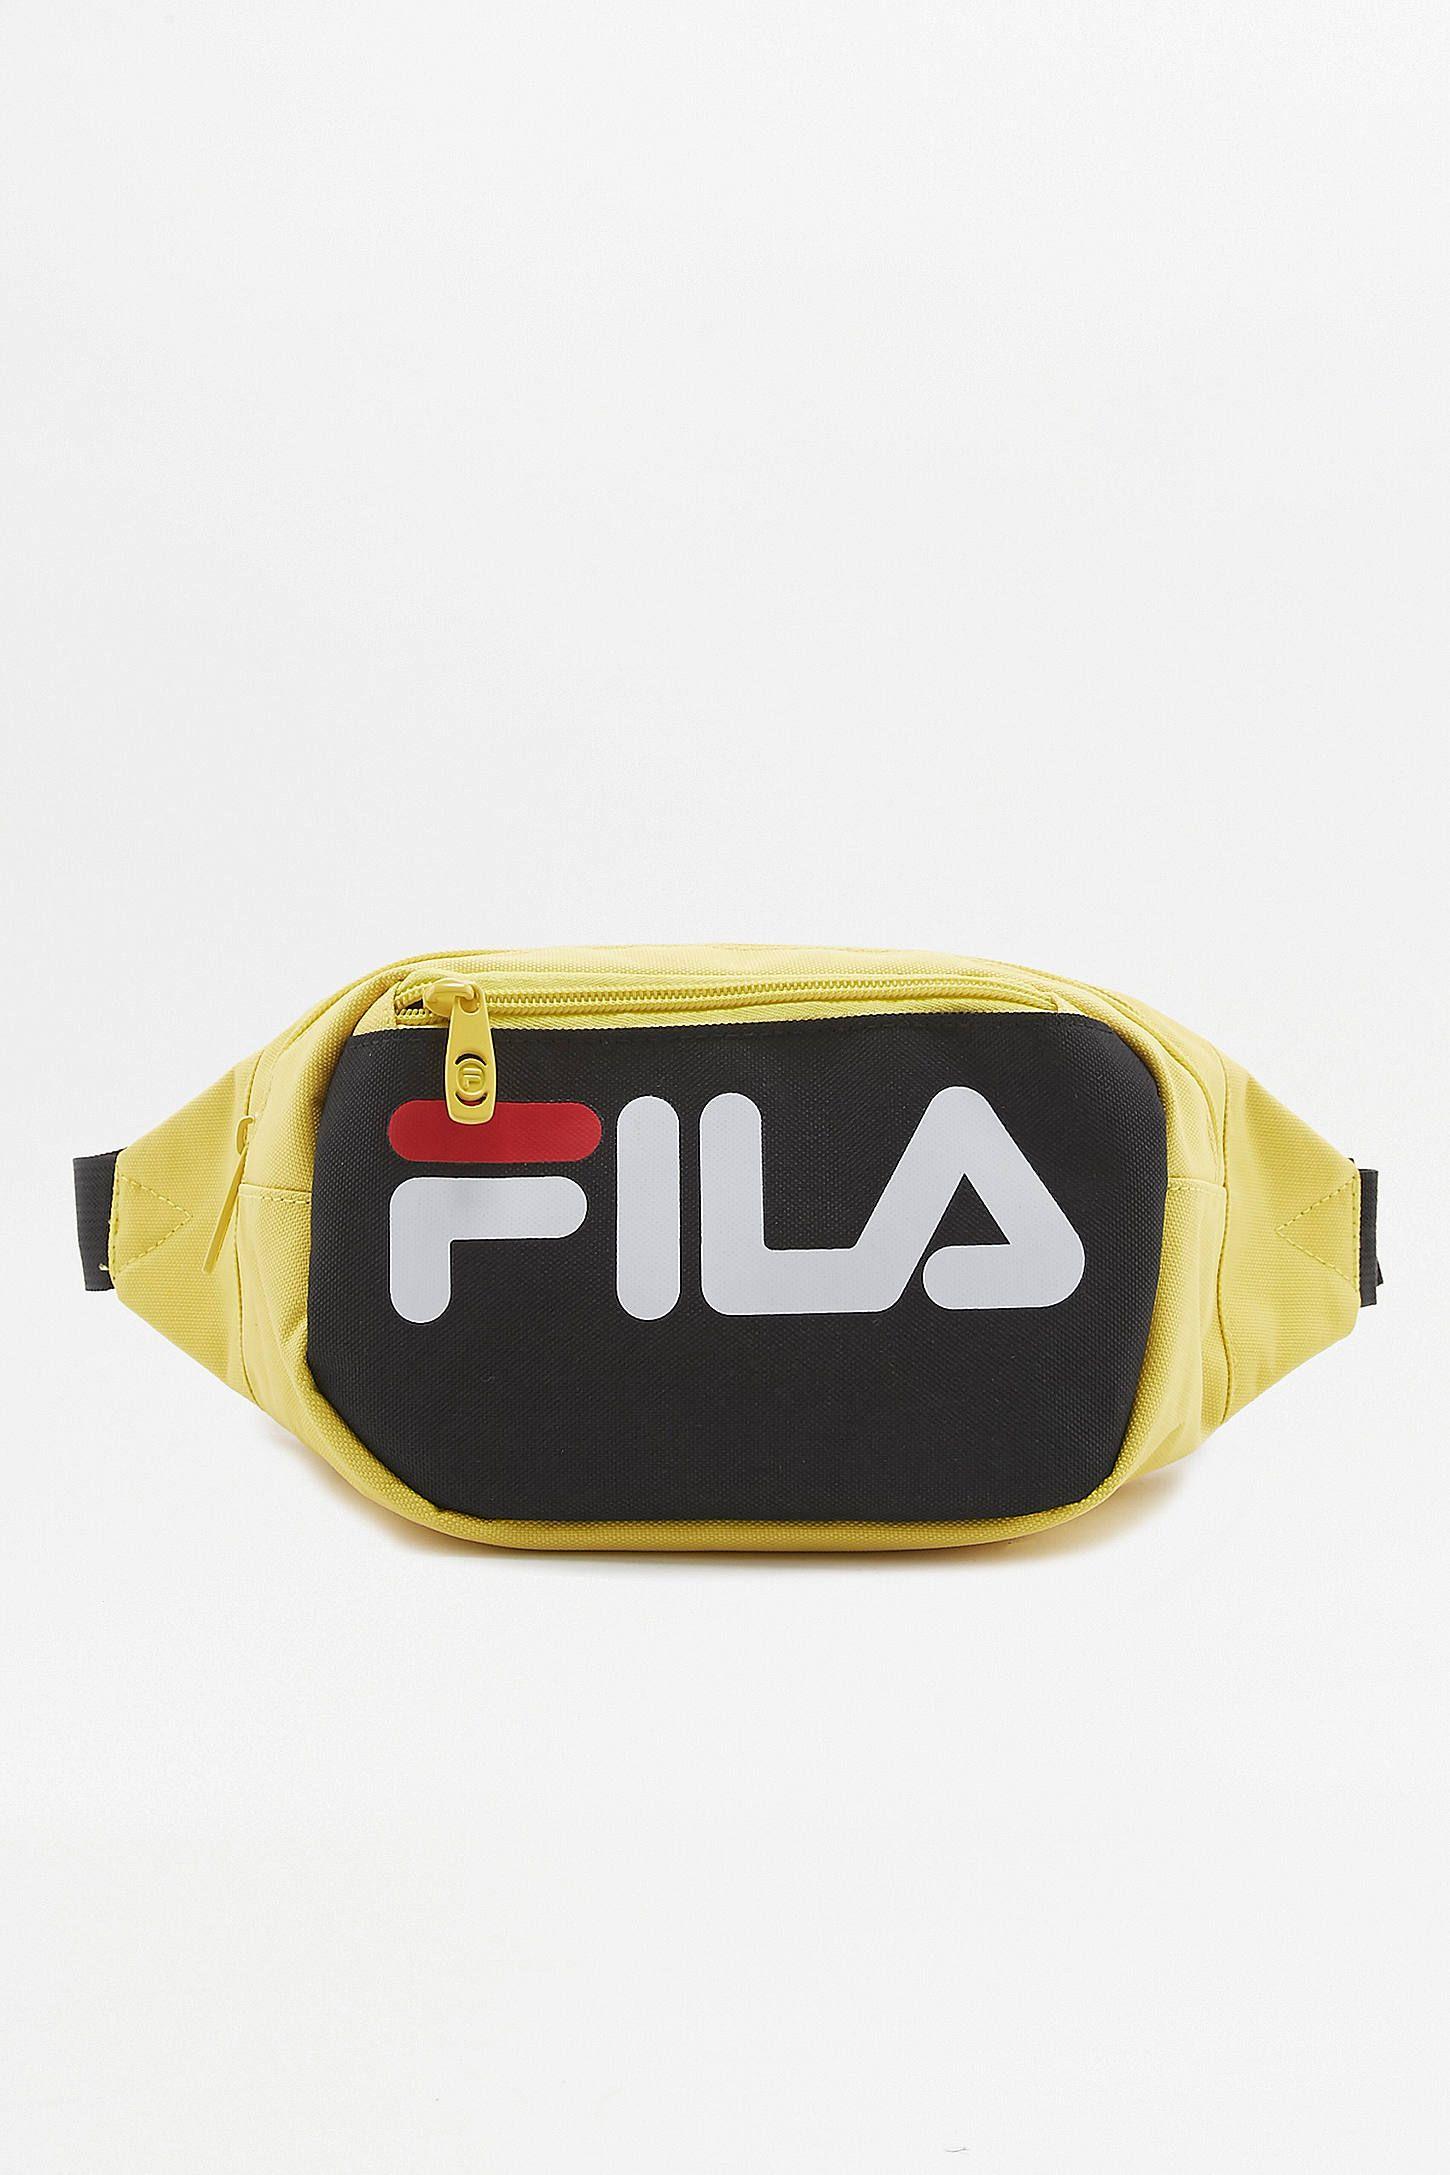 fila fanny pack yellow